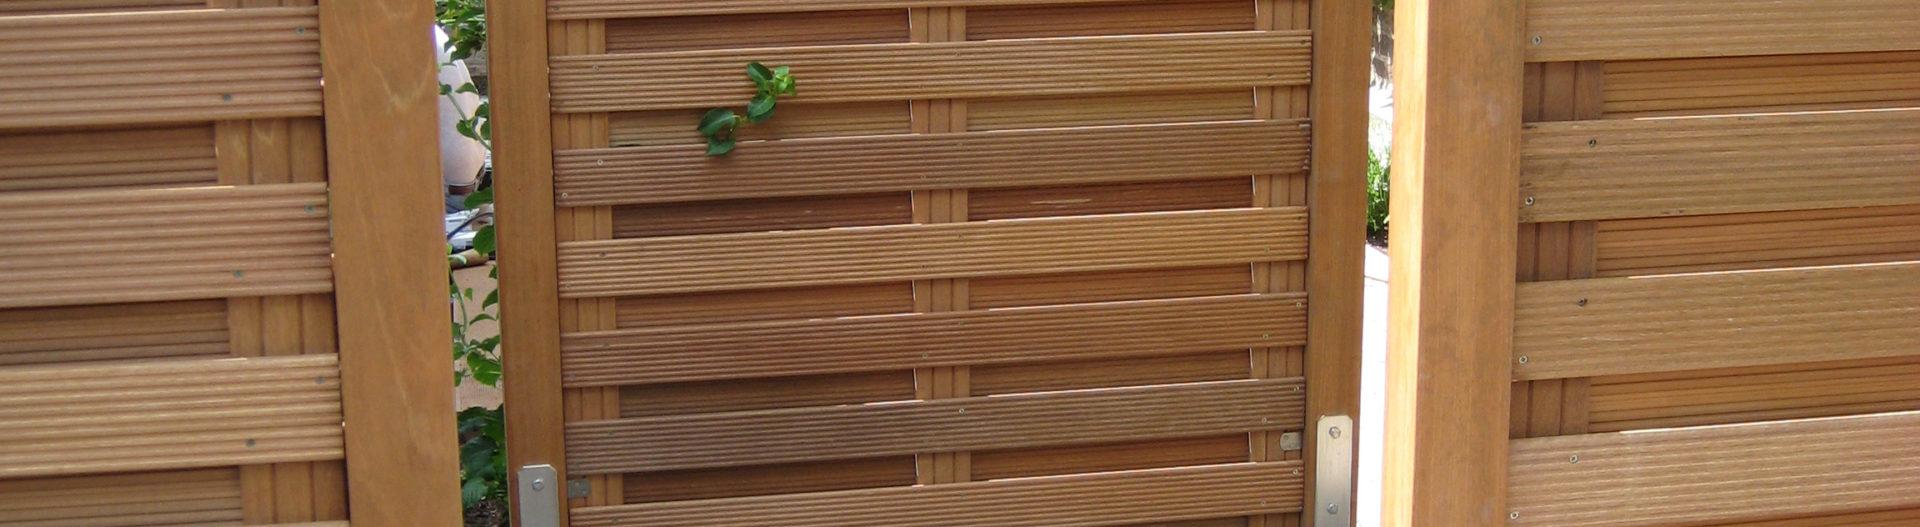 Zaunbau – Sichtschutzzäune